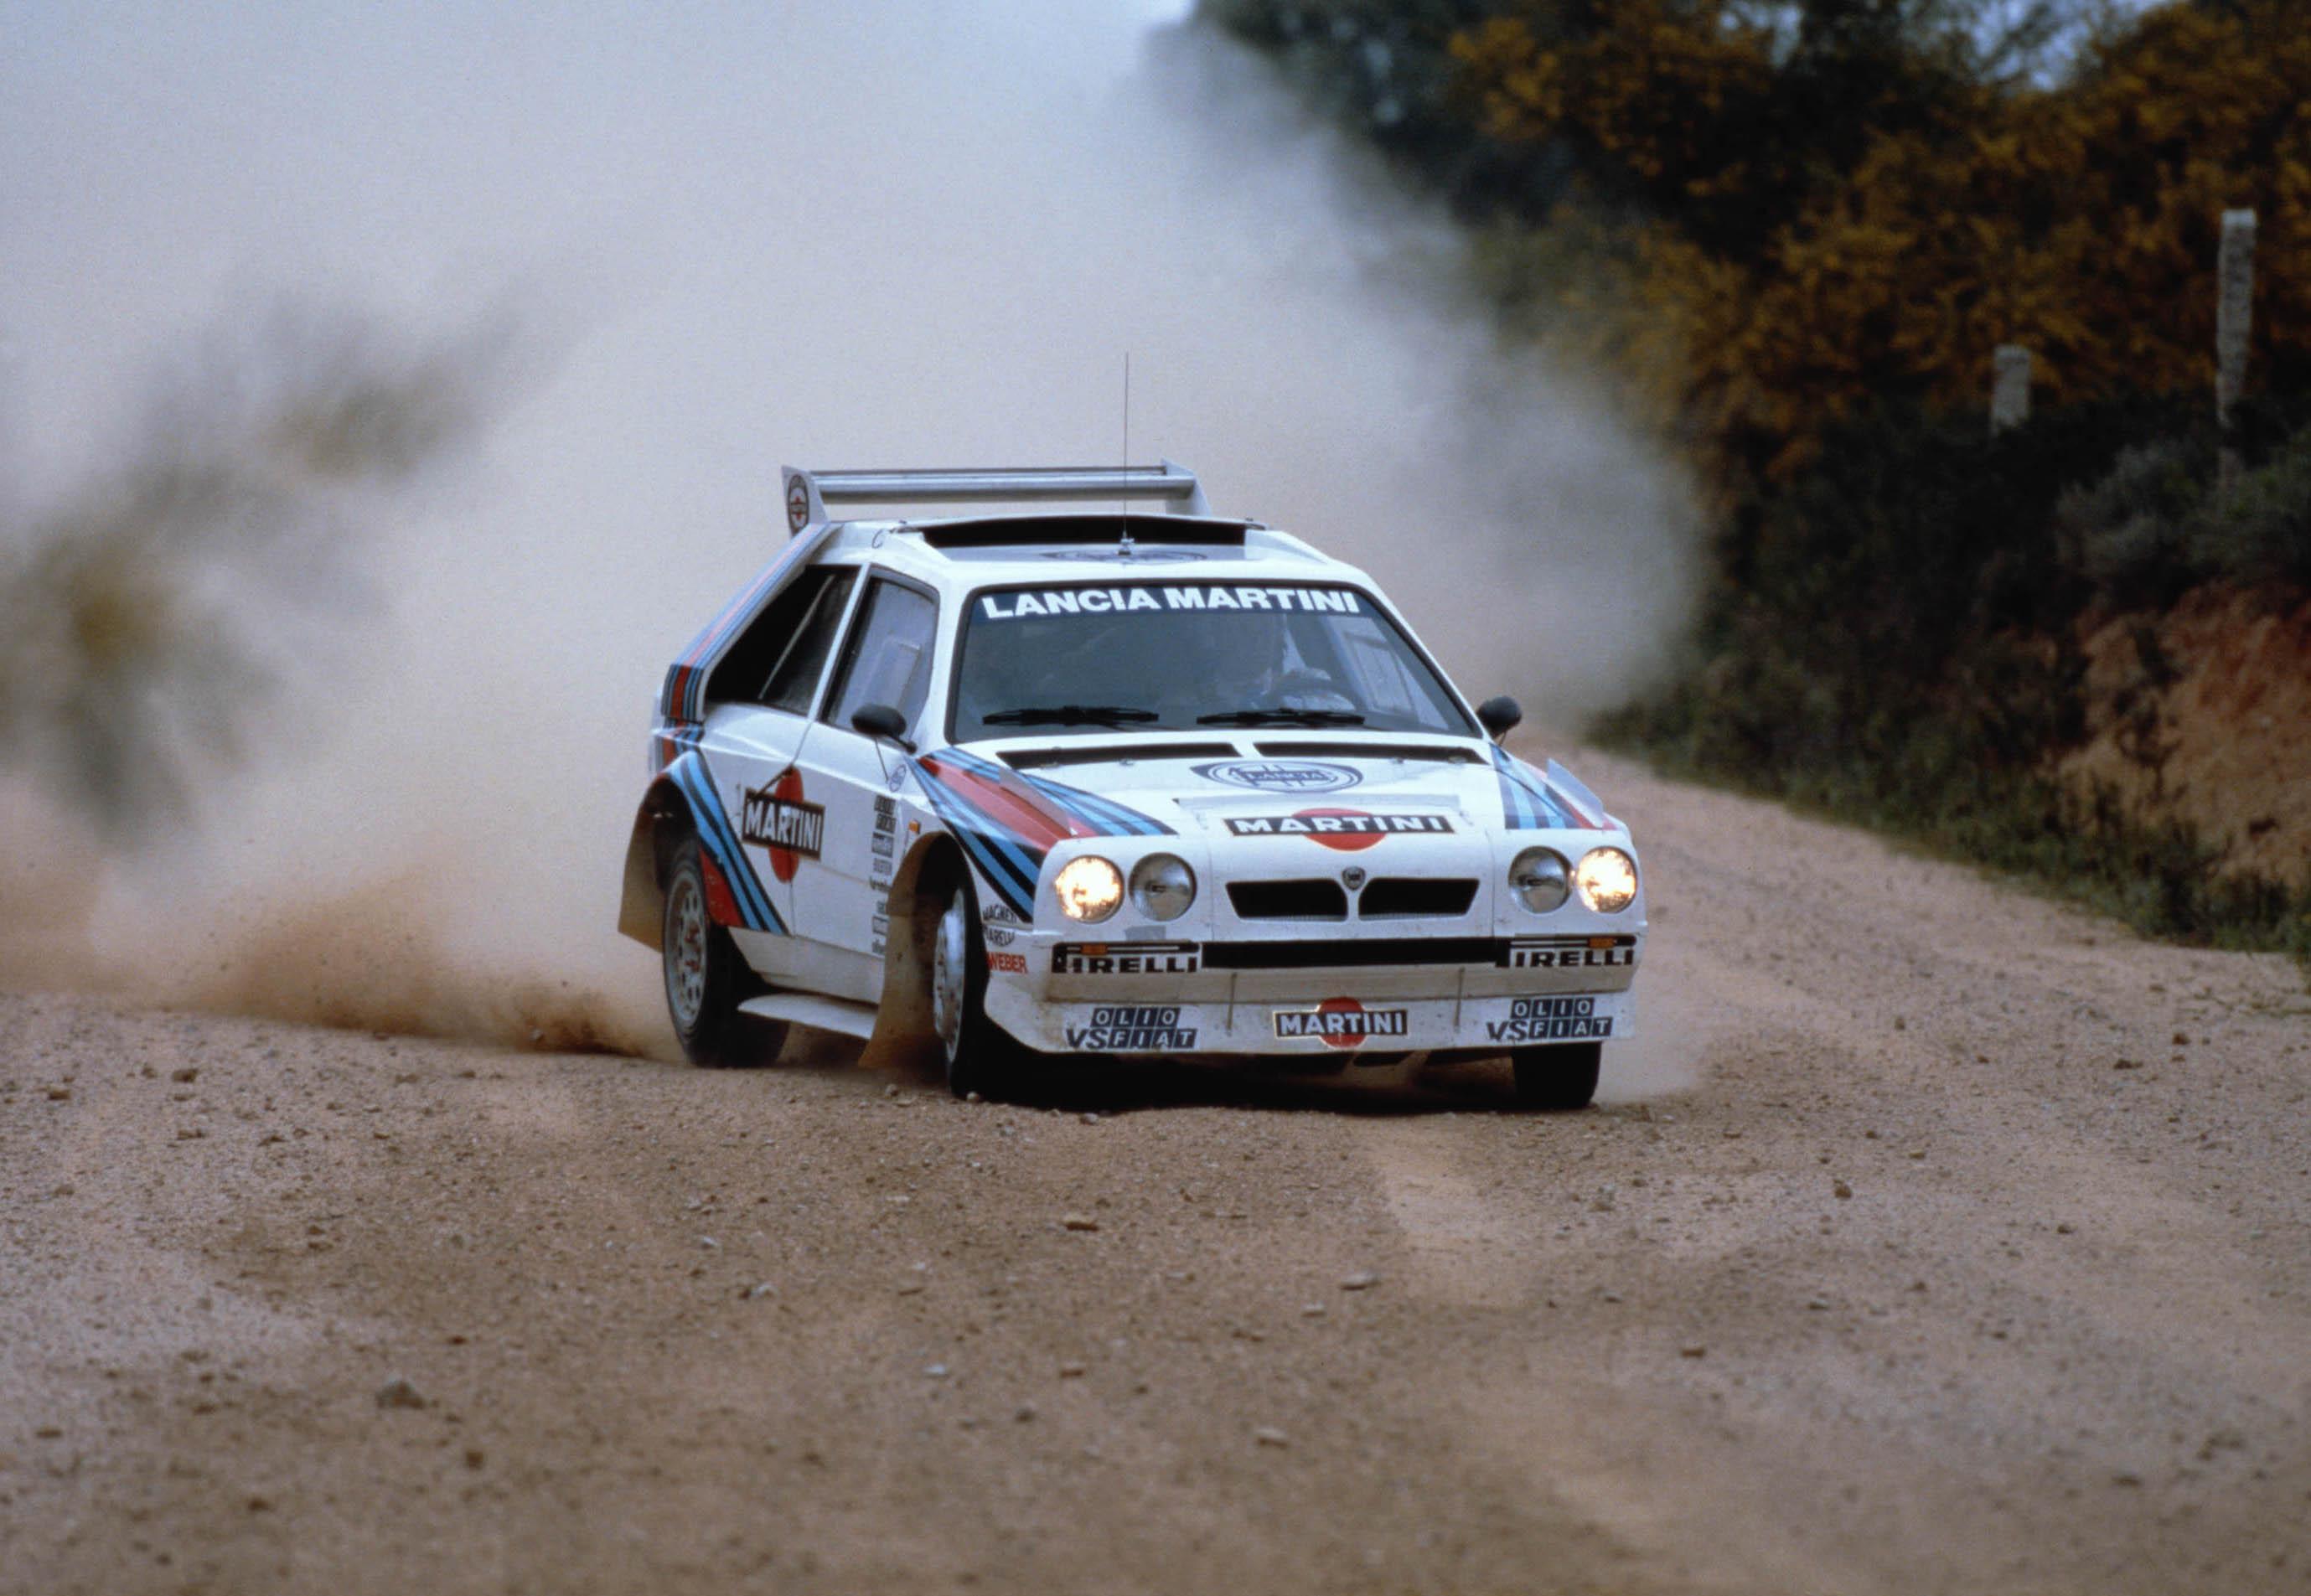 Lancia Delta dirt track